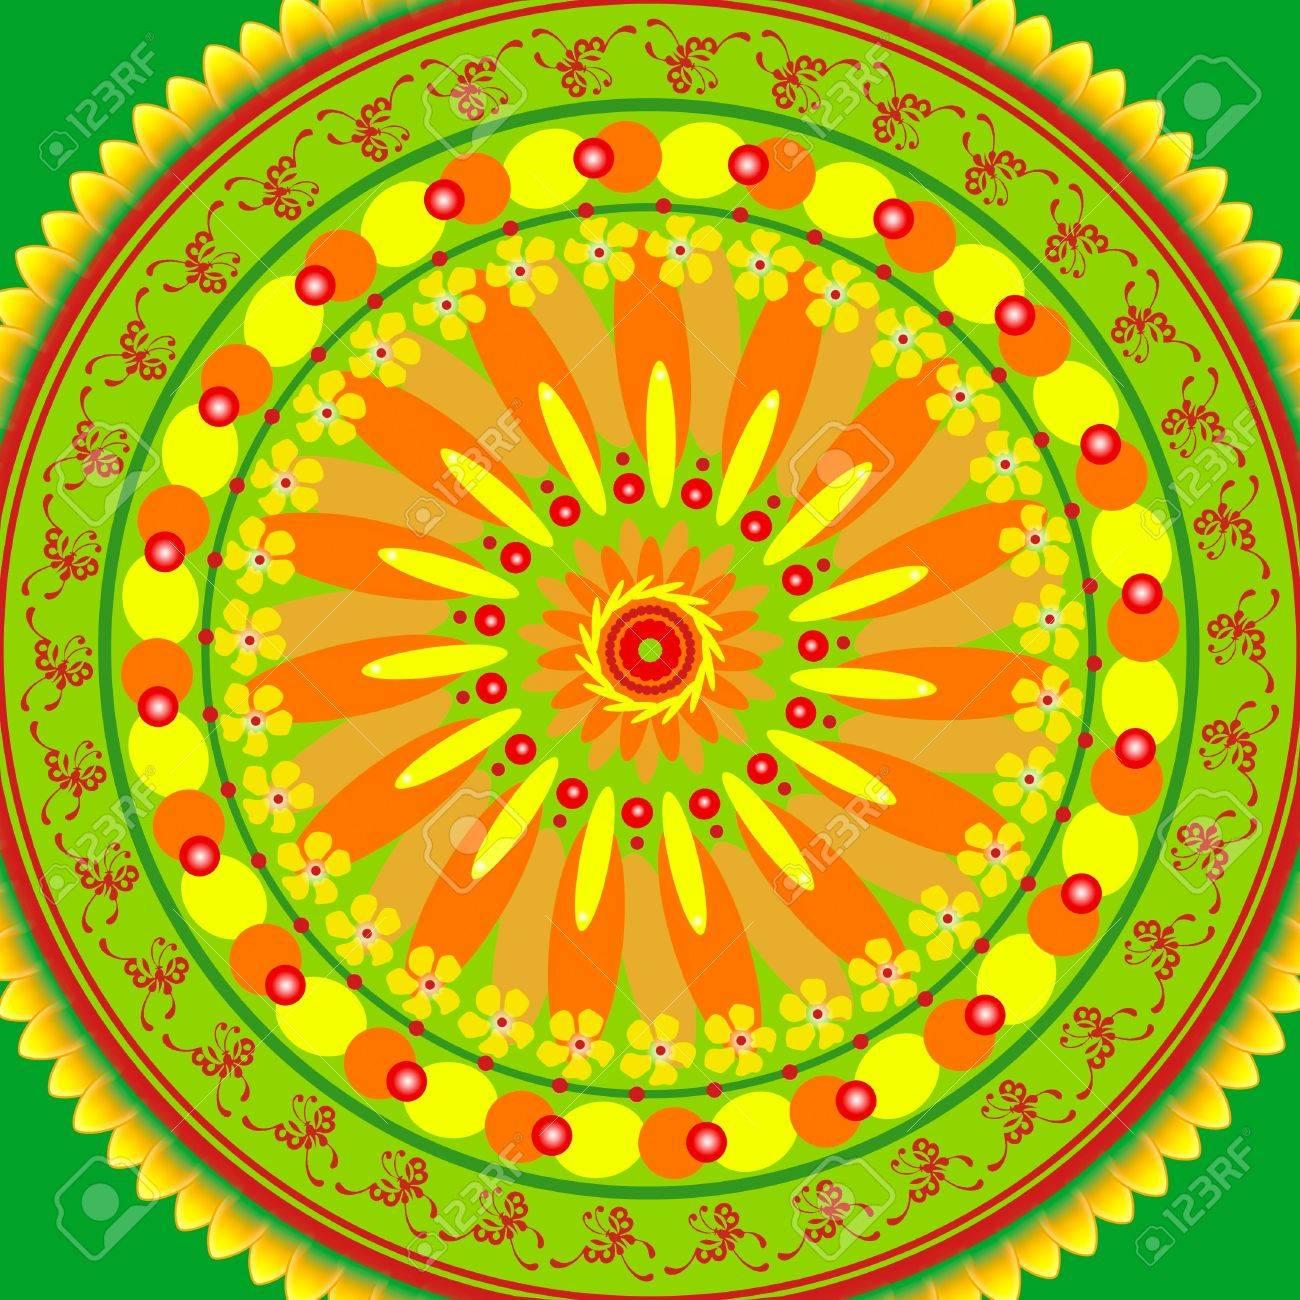 Mandala circular abstract pattern colorful floral kaleidoscopic image background Stock Photo - 13002429